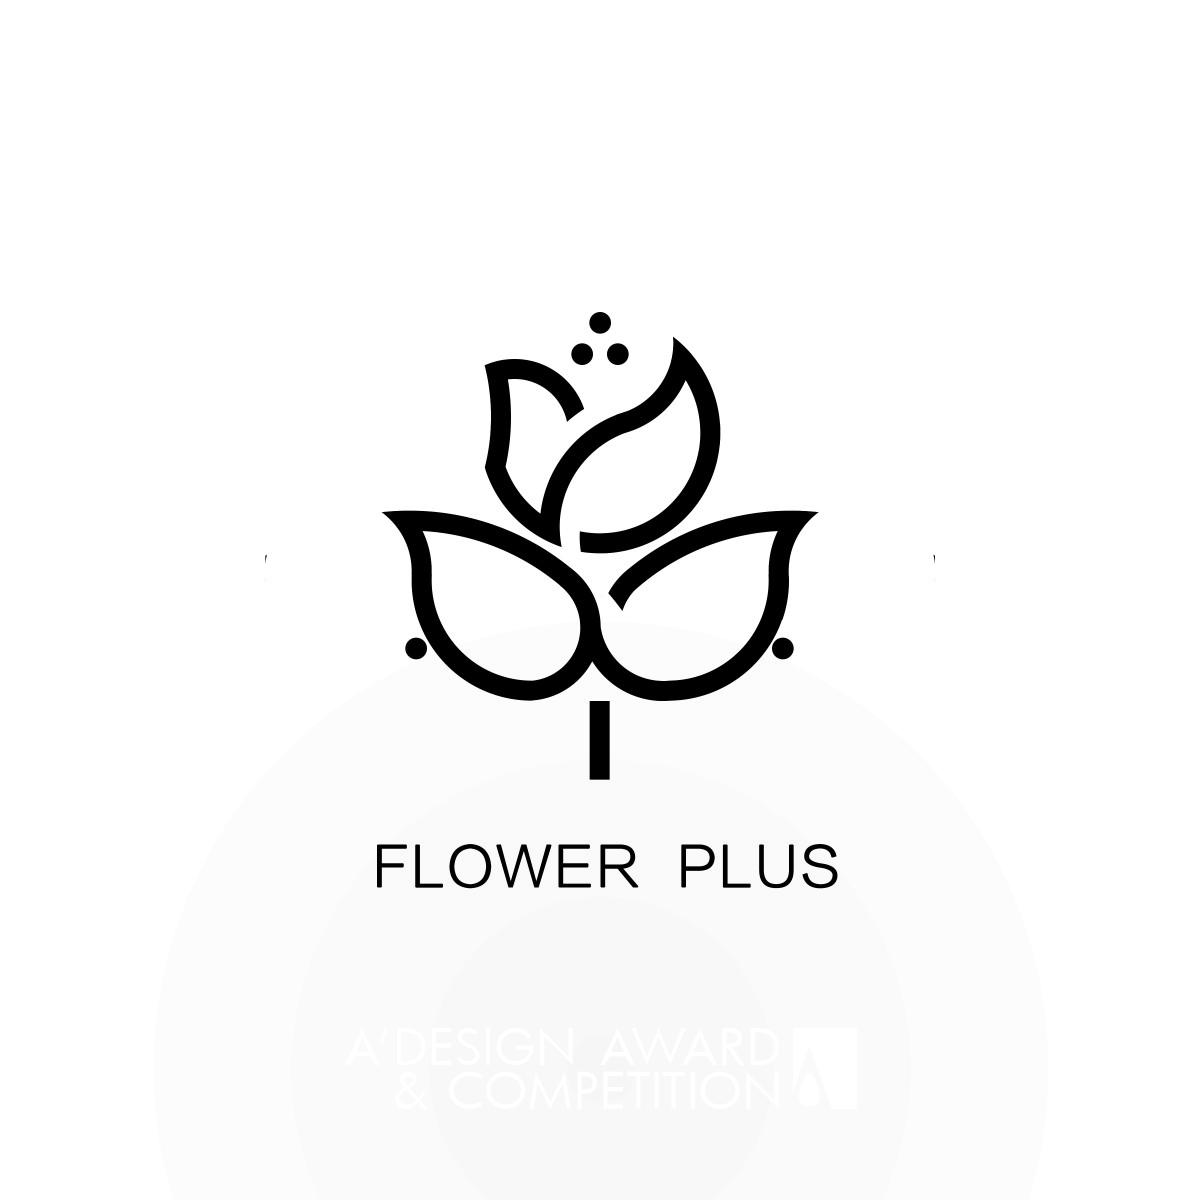 Flower+ Corporate Identity